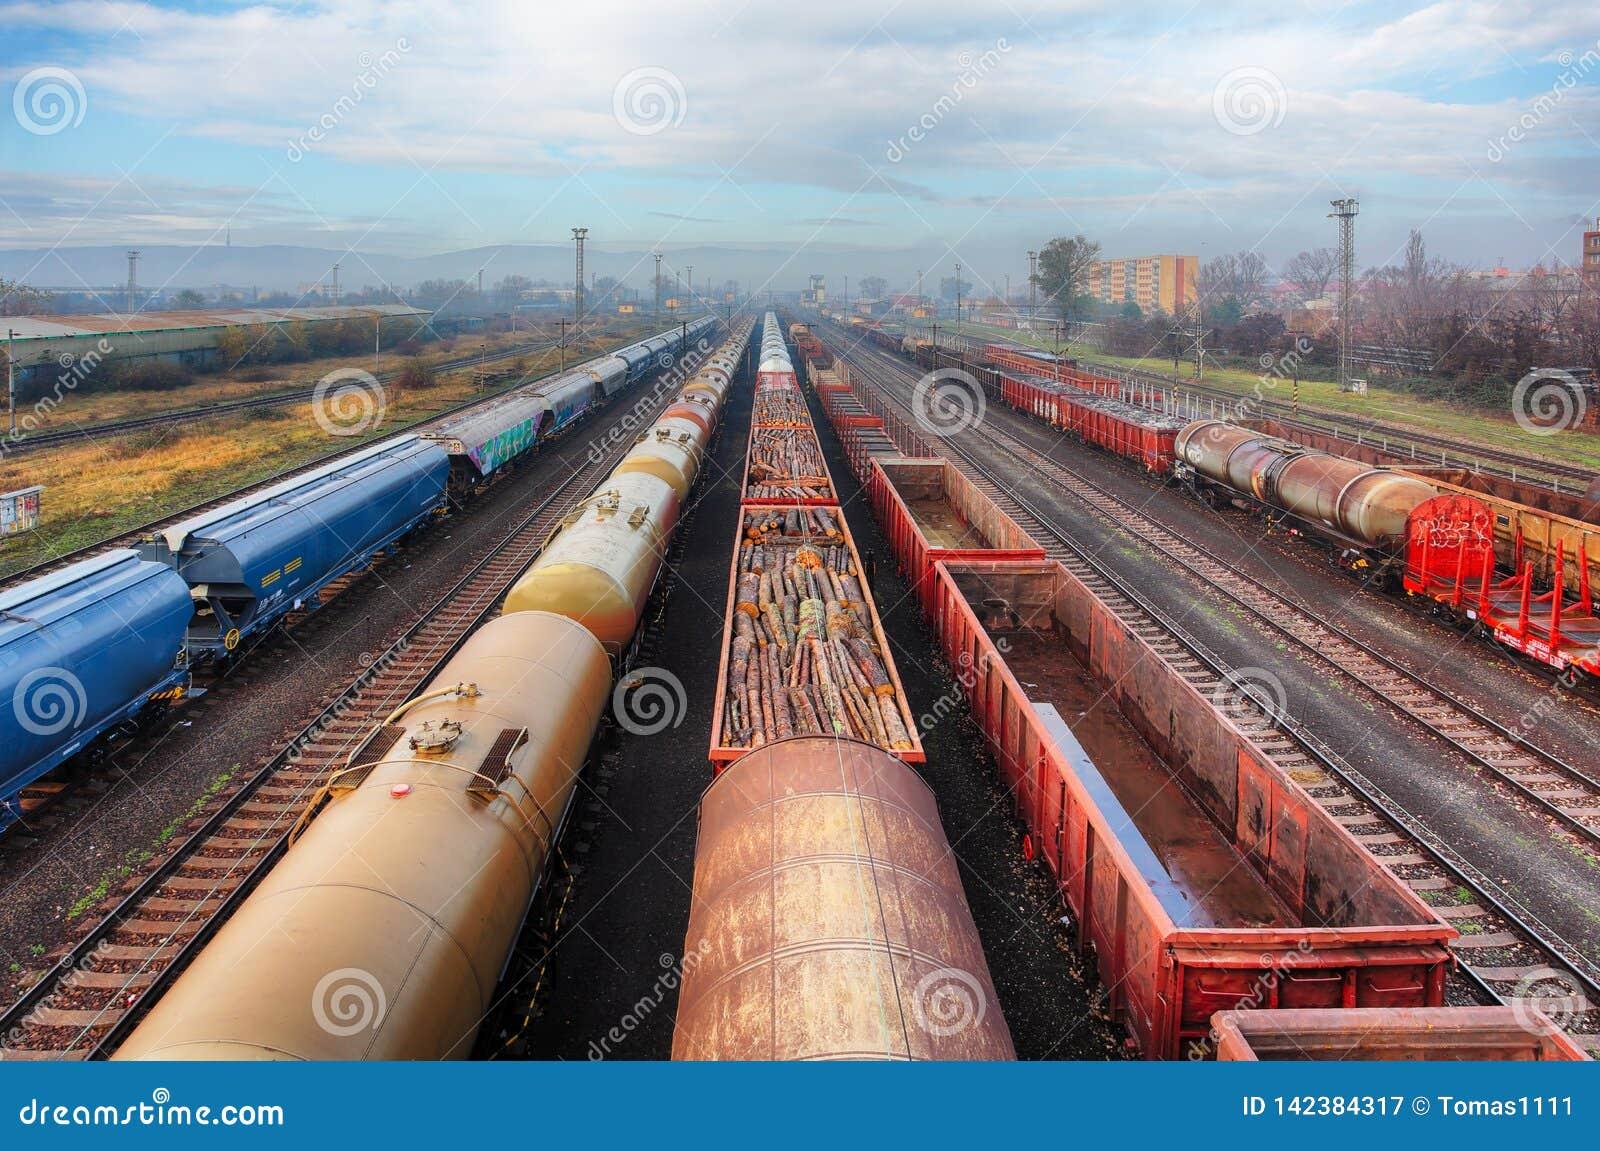 Railway station freight trains, Cargo transport